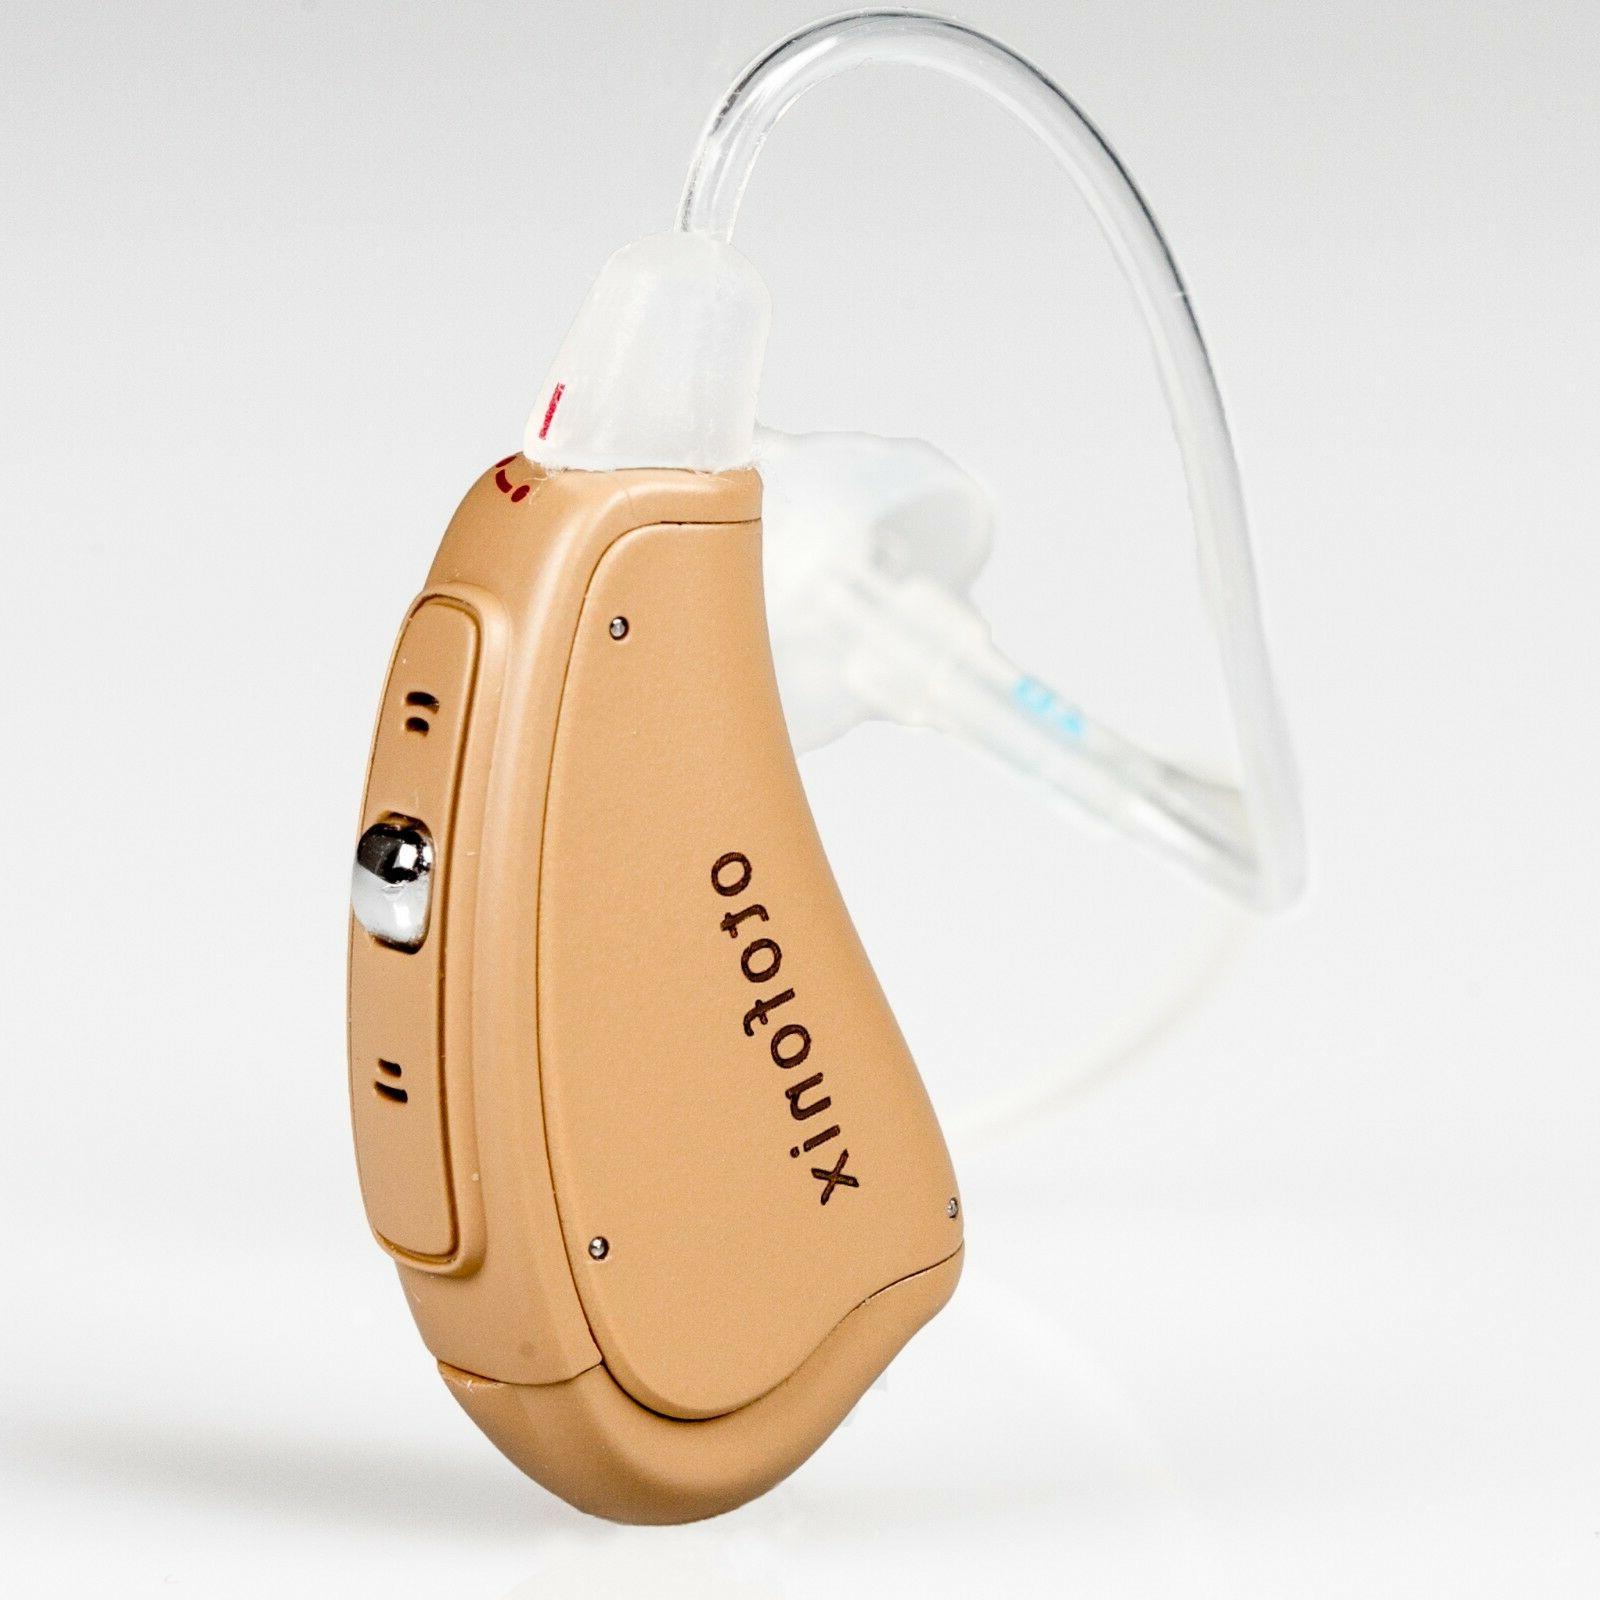 Otofonix Hearing Amplifier